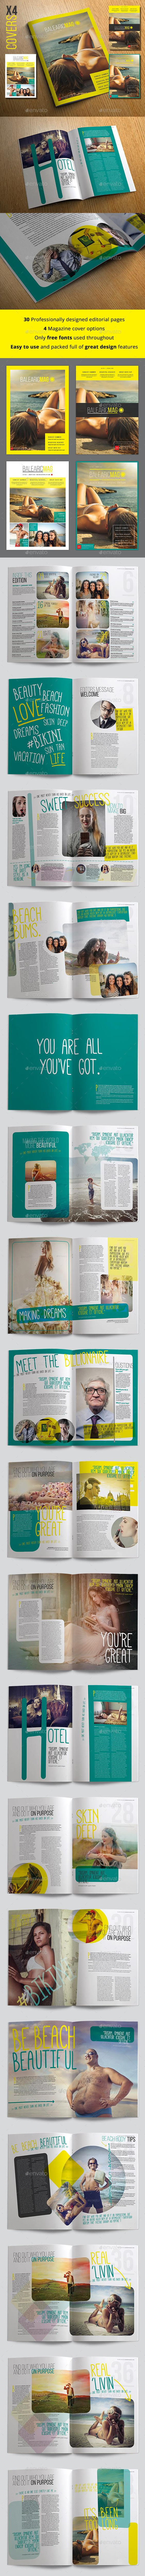 Balearic Summer Magazine - Magazines Print Templates